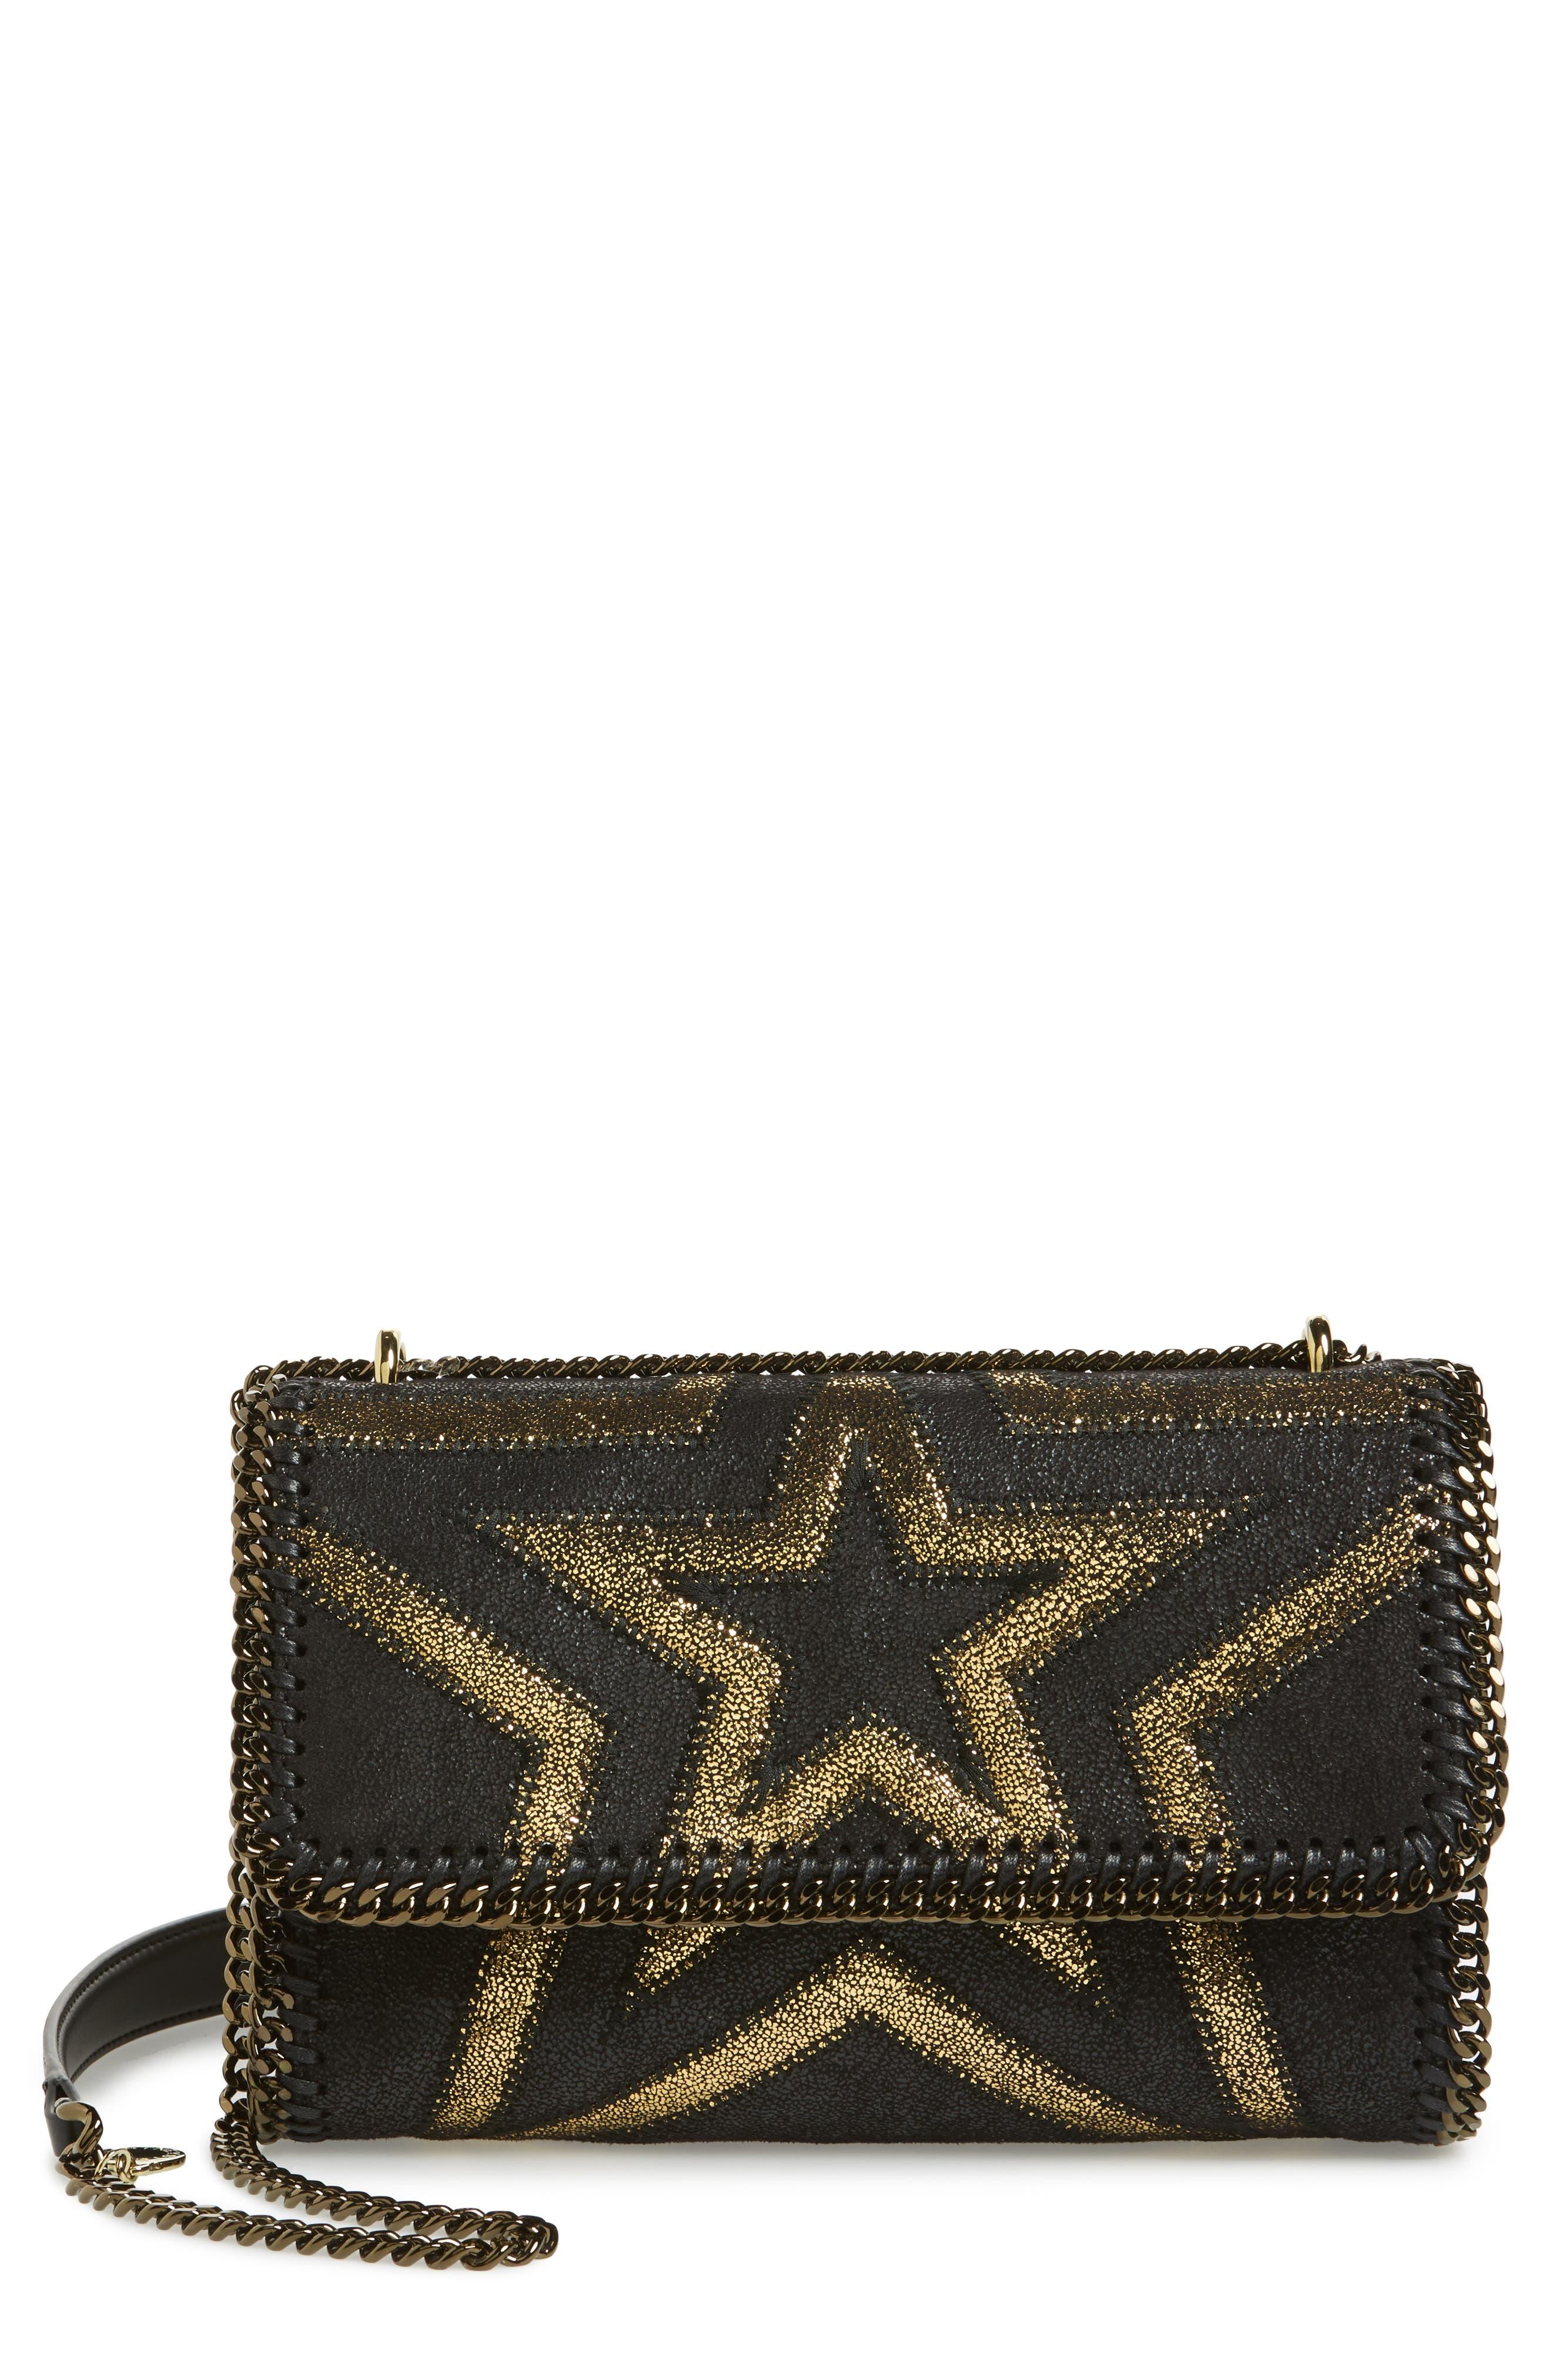 Stella McCartney Small Falabella Shaggy Deer Star Faux Leather Shoulder Bag